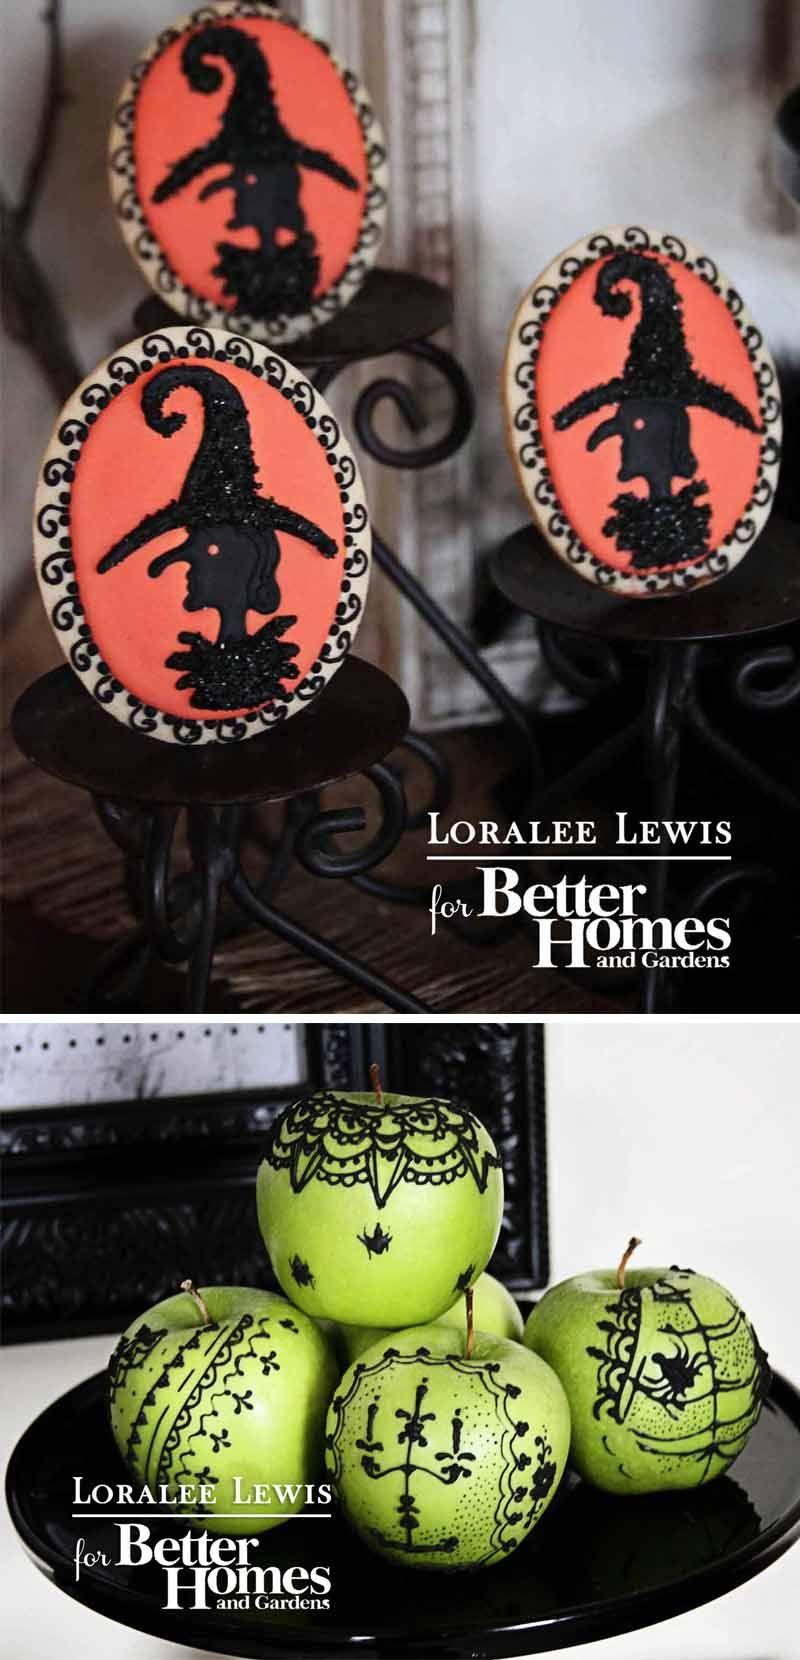 44a34b231bfa45cab9db31ca3198e940 - Better Homes And Gardens Halloween Tricks And Treats Magazine 2017